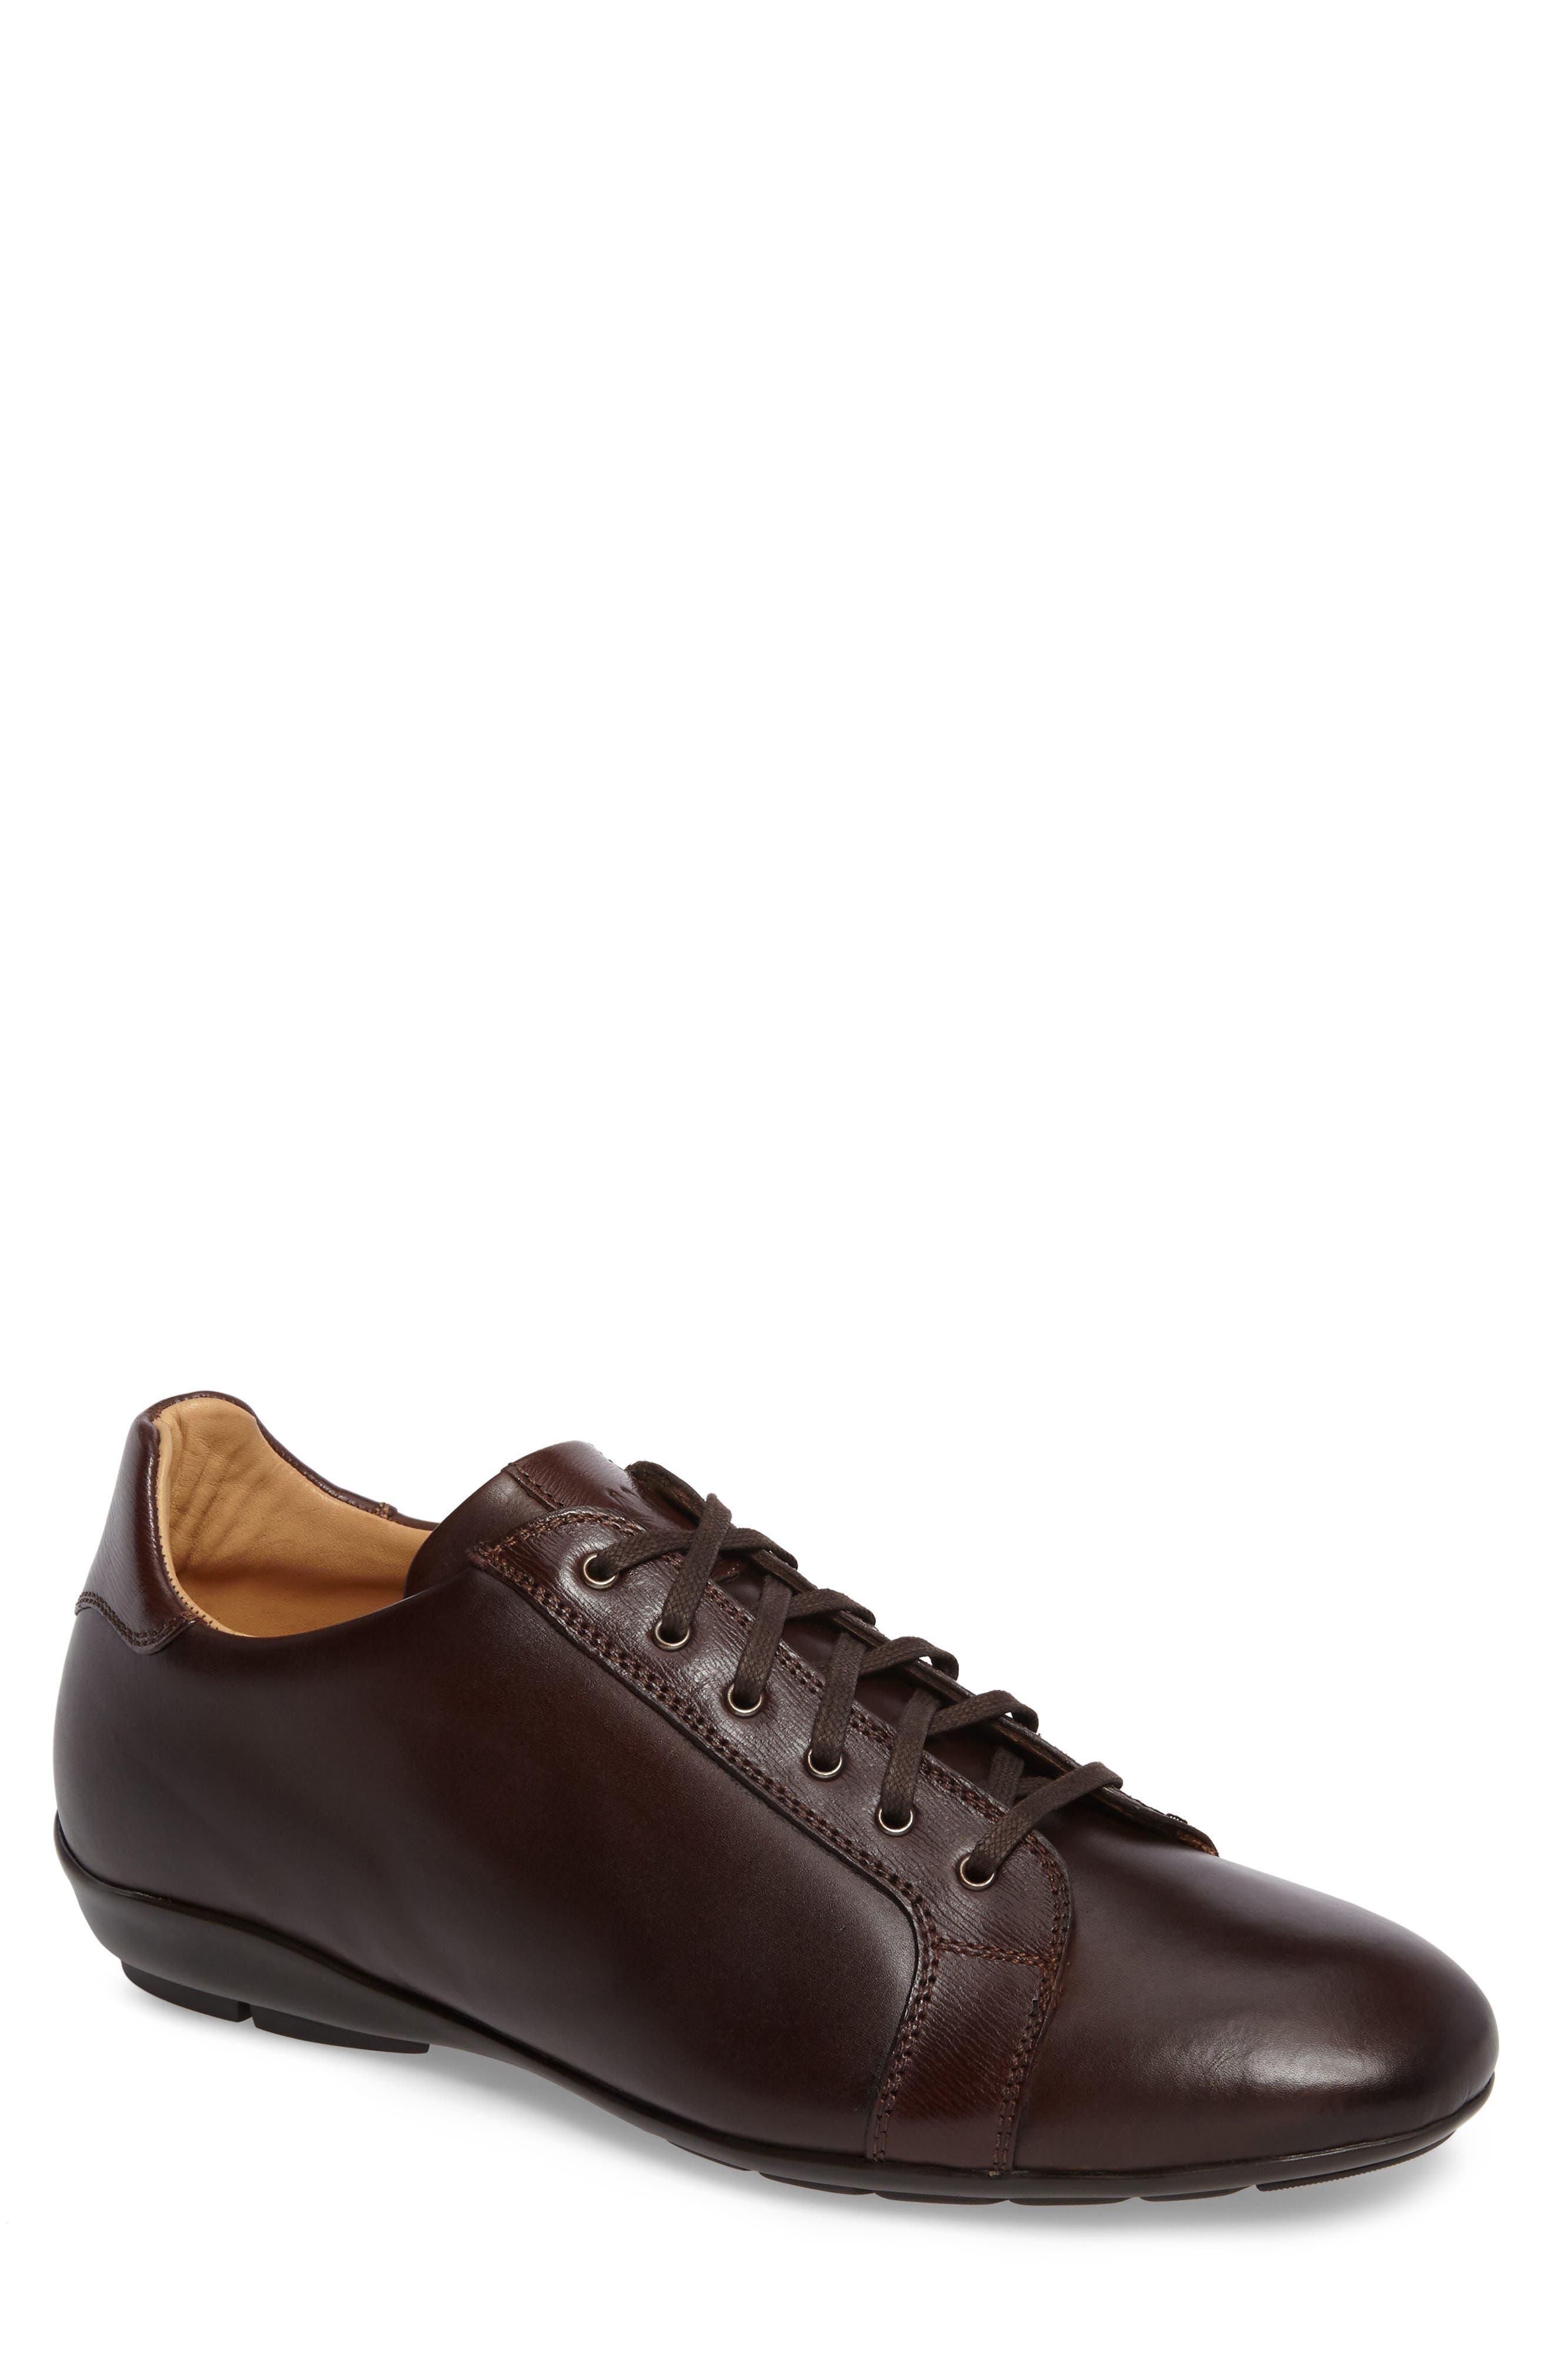 Ubrique Sneaker,                         Main,                         color, Brown Multi Leather